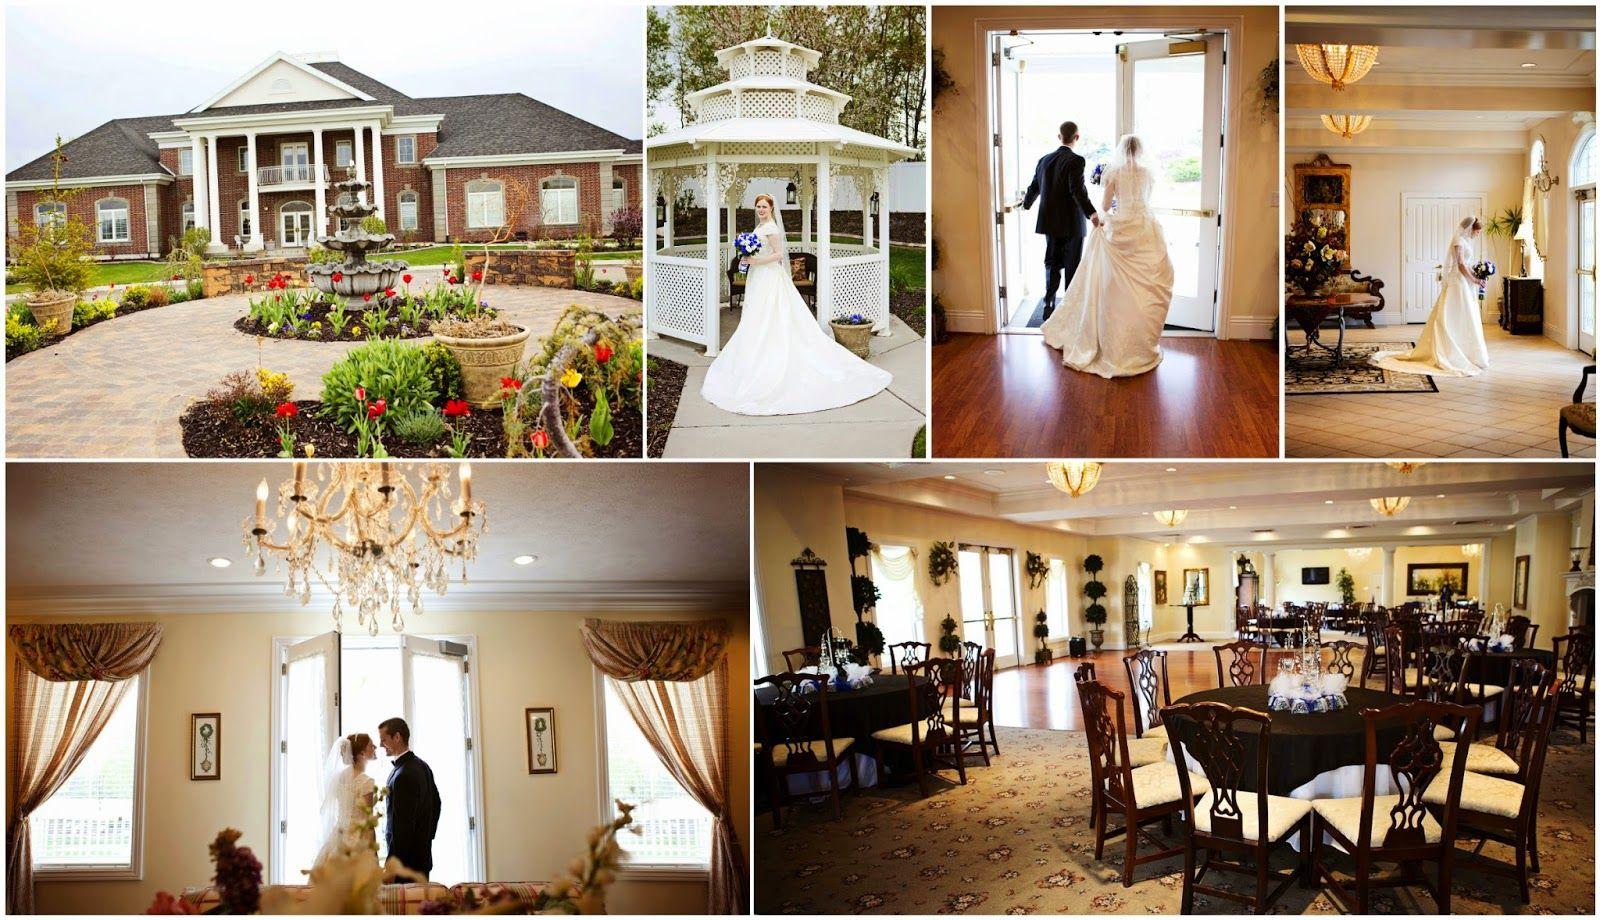 Magnolia Grove Reception Center Magnoliagrove Wedding Venues In